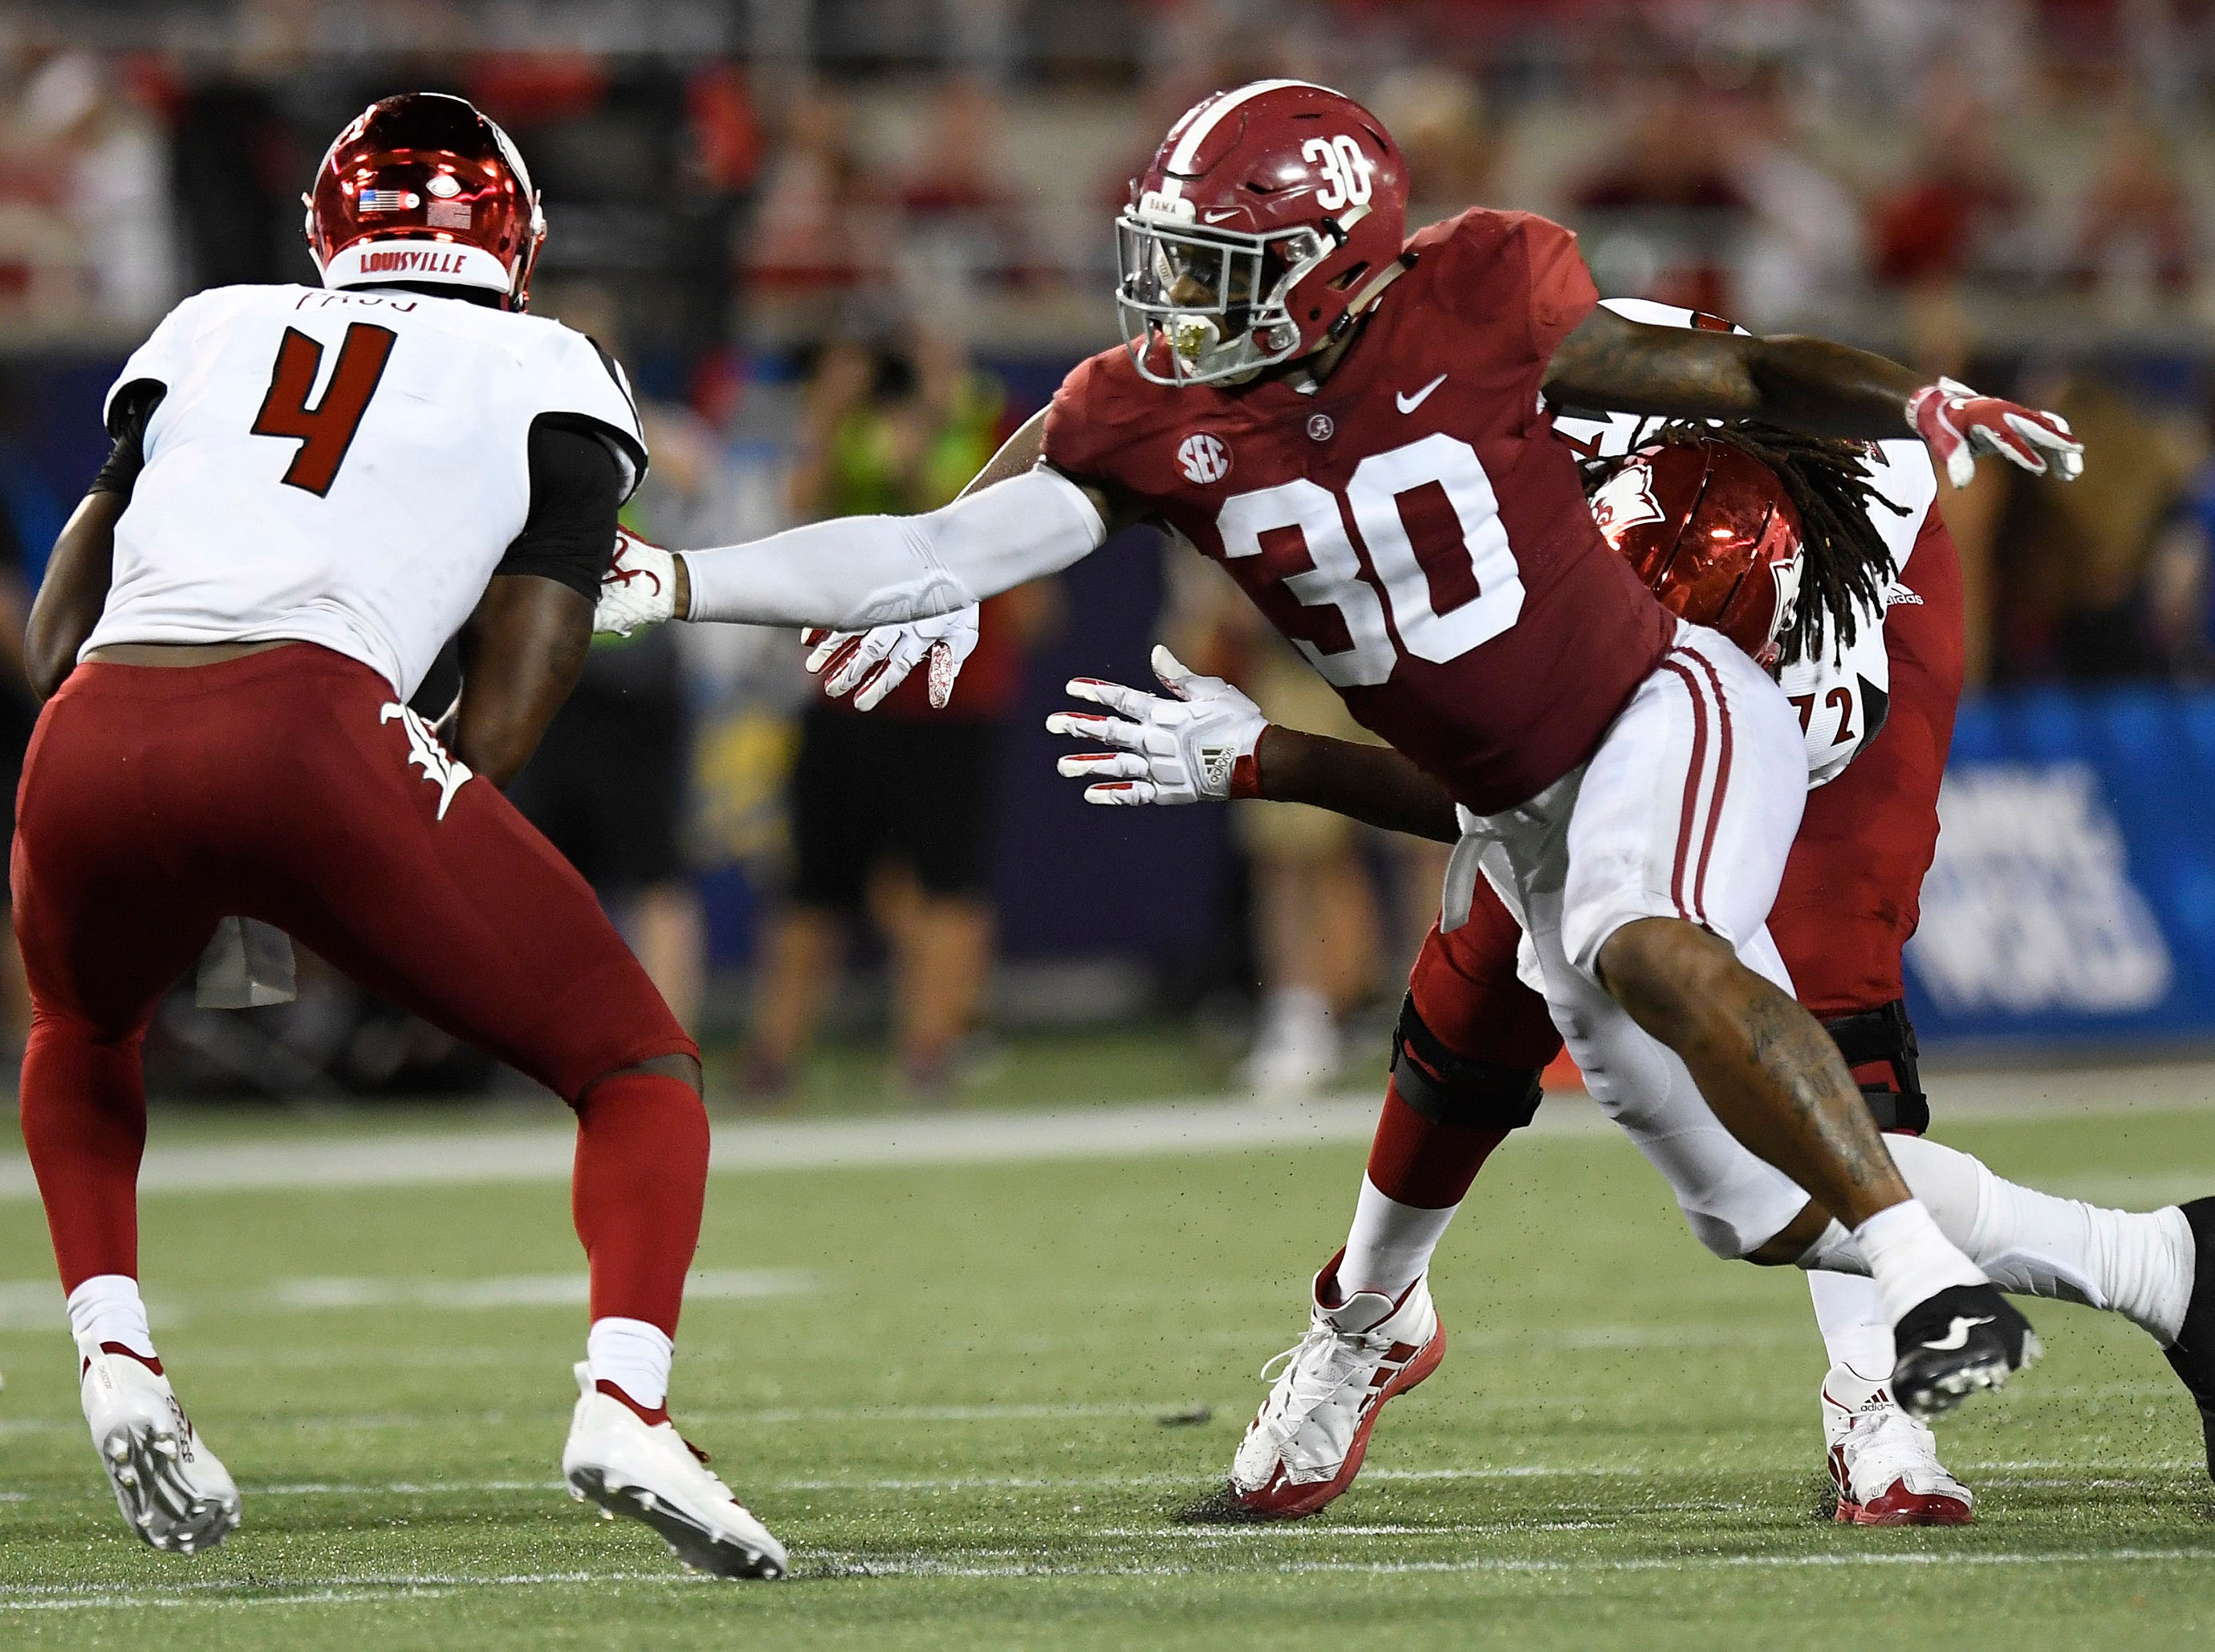 Alabama linebacker Mack Wilson (30) pressures Louisville quarterback Jawon Pass (4) In second half action of the Camping World Kickoff at Camping World Stadium in Orlando, Fla., on Saturday September 1, 2018.